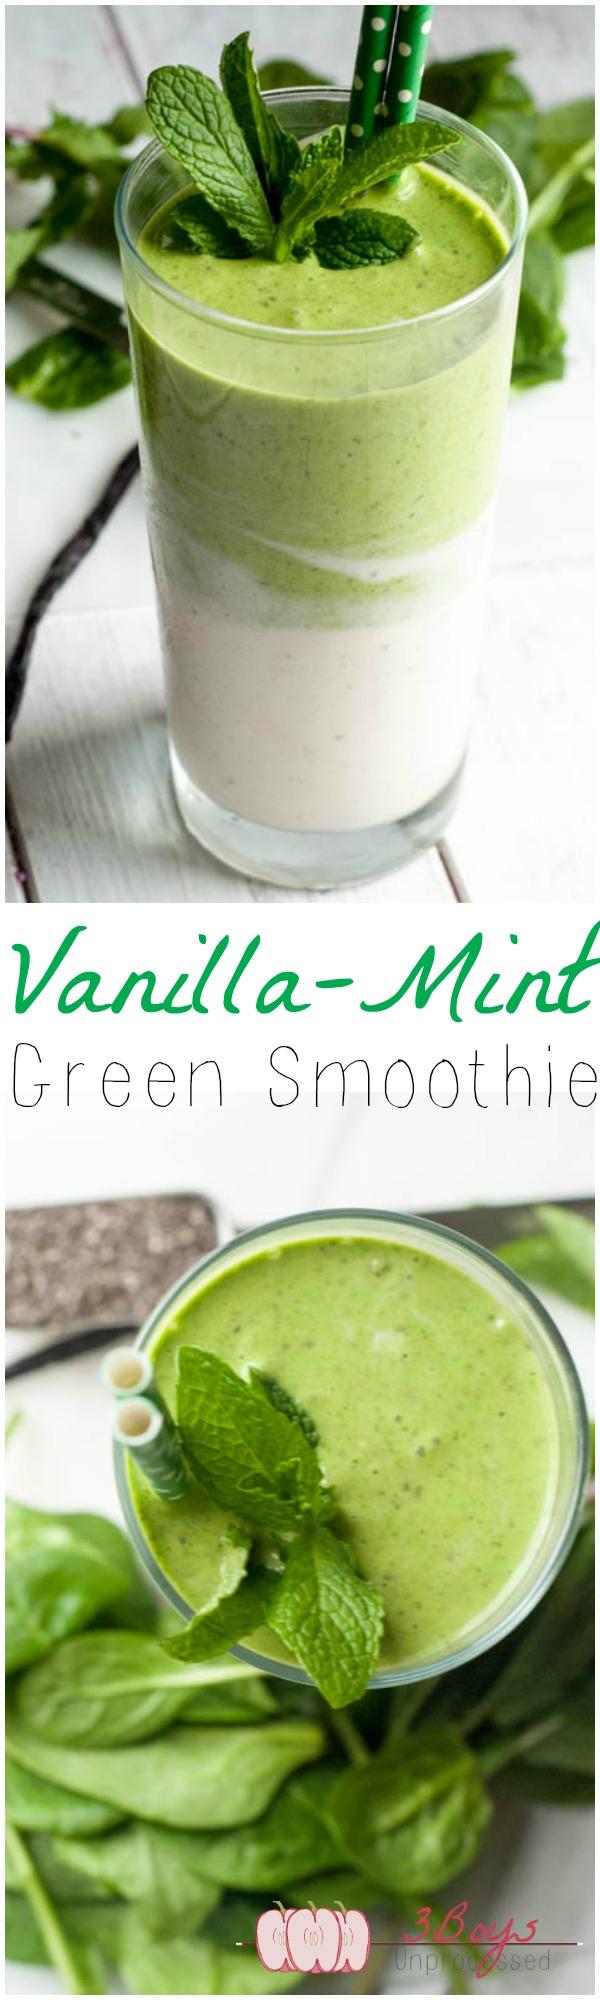 Super Vanilla Mint Green Smoothie - Pretty Little Apron YV-23